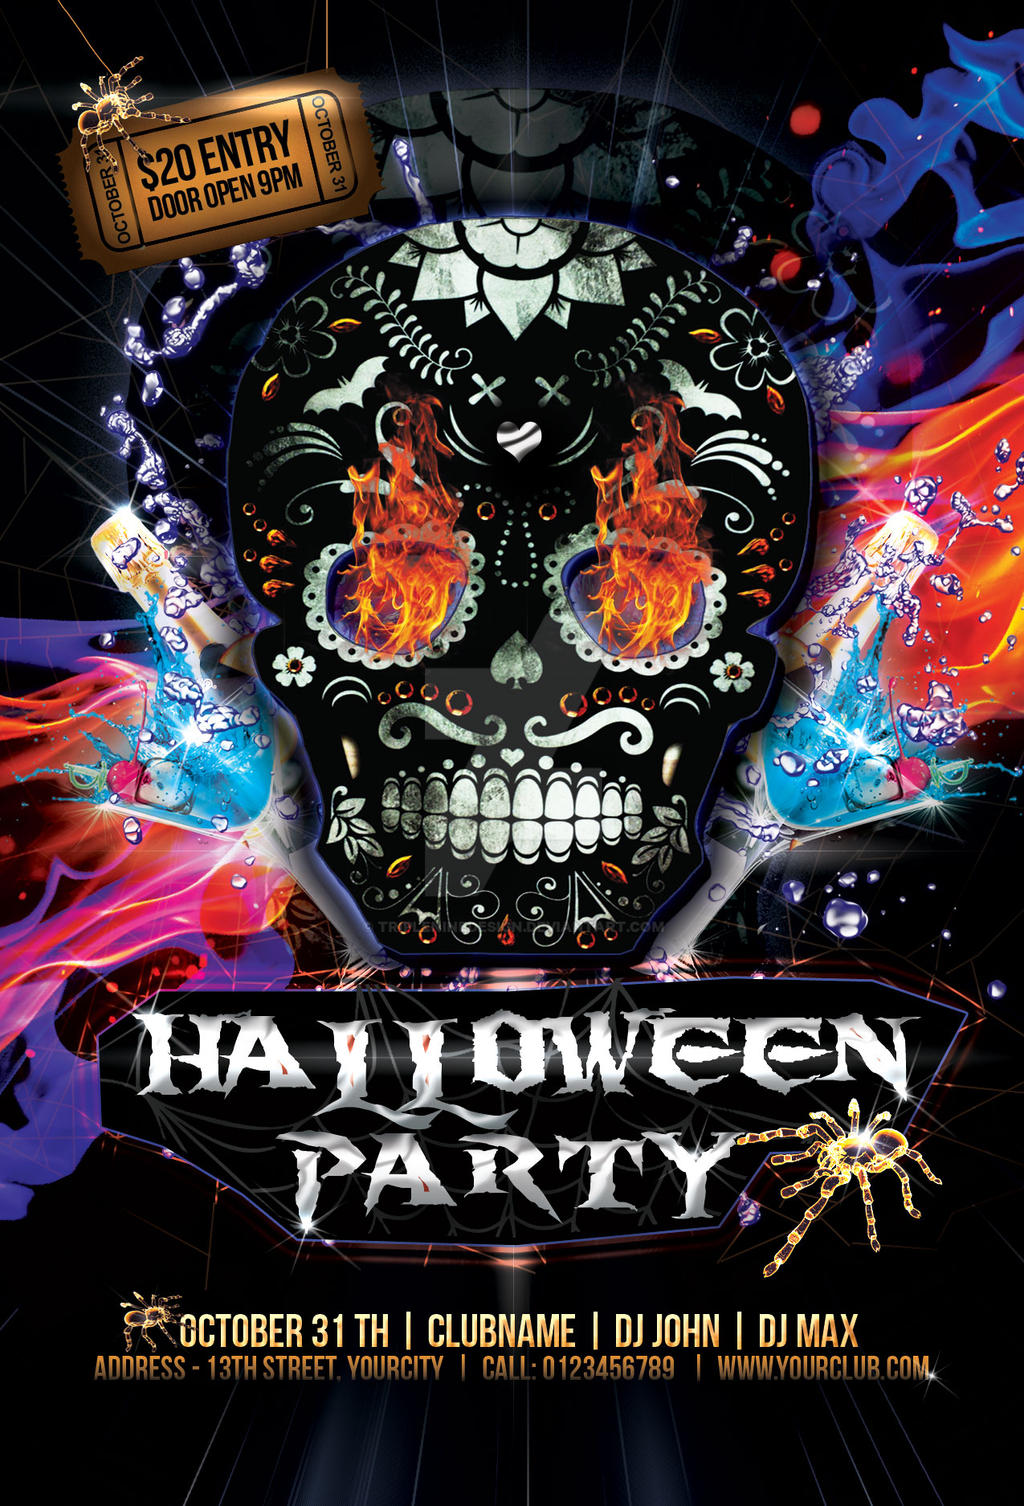 Halloween Party Flyer by tripleninedesign on DeviantArt